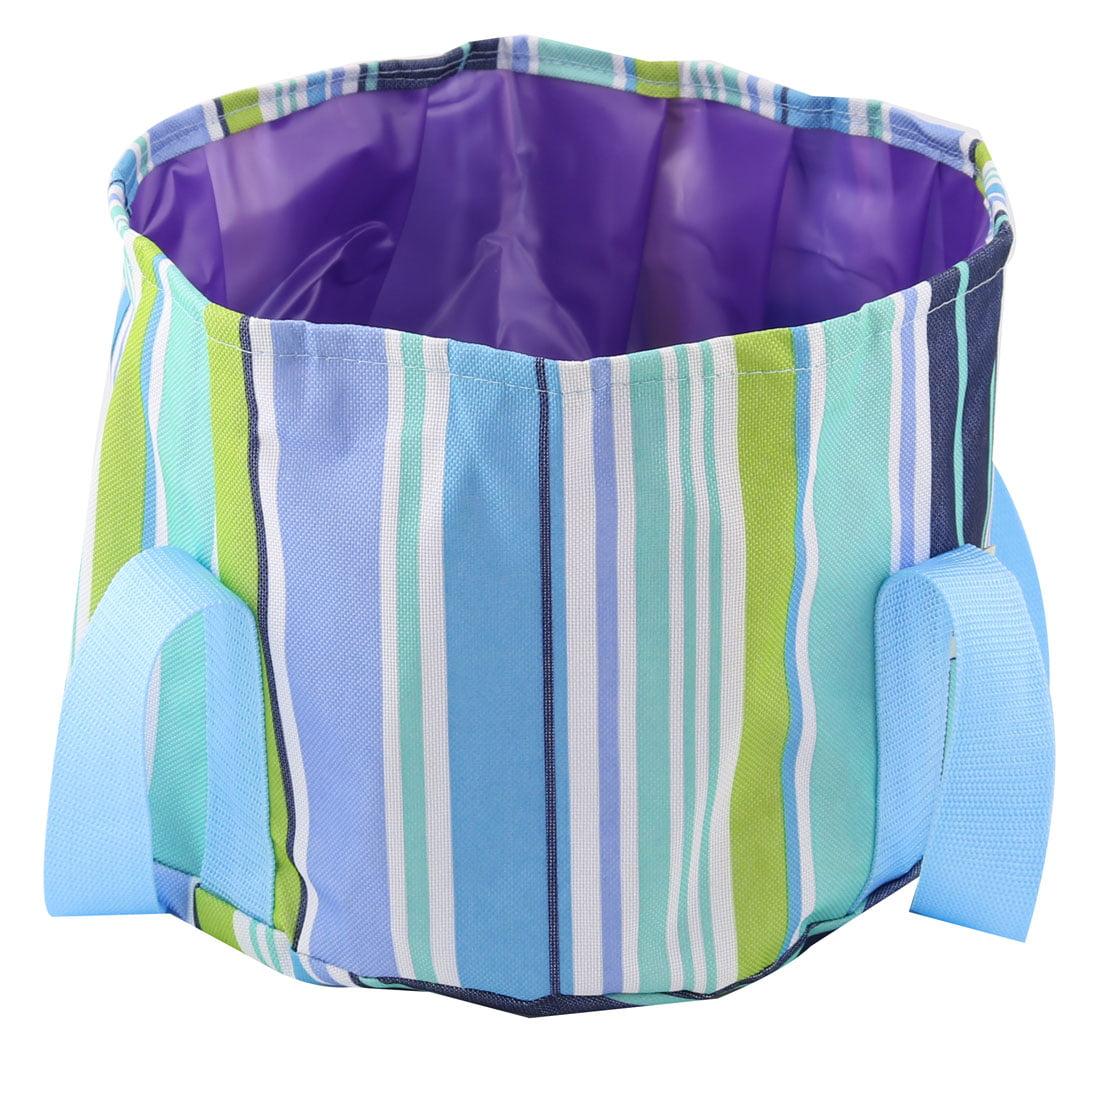 Outdoor Stripe Pattern Portable Foldaway Water Storage Bucket Washbasin Blue